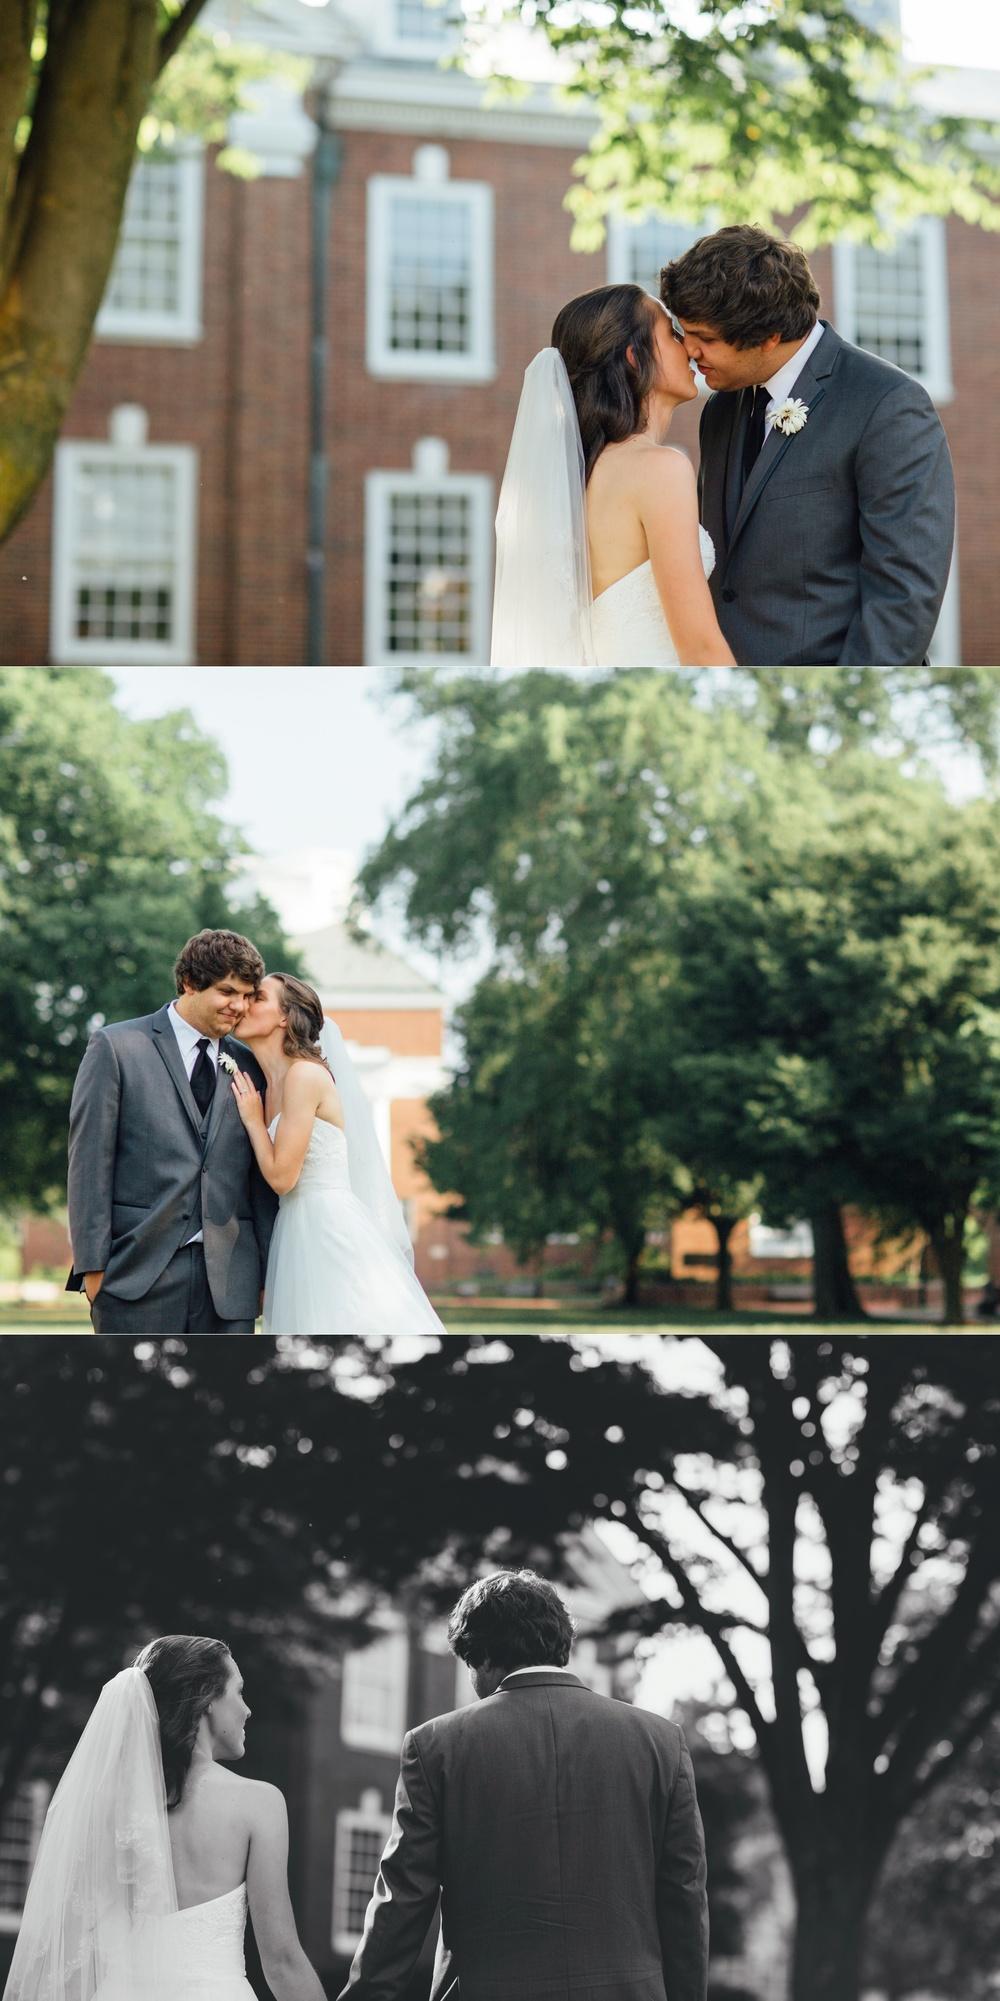 jake-and-katie-wedding-favorites-2015-37